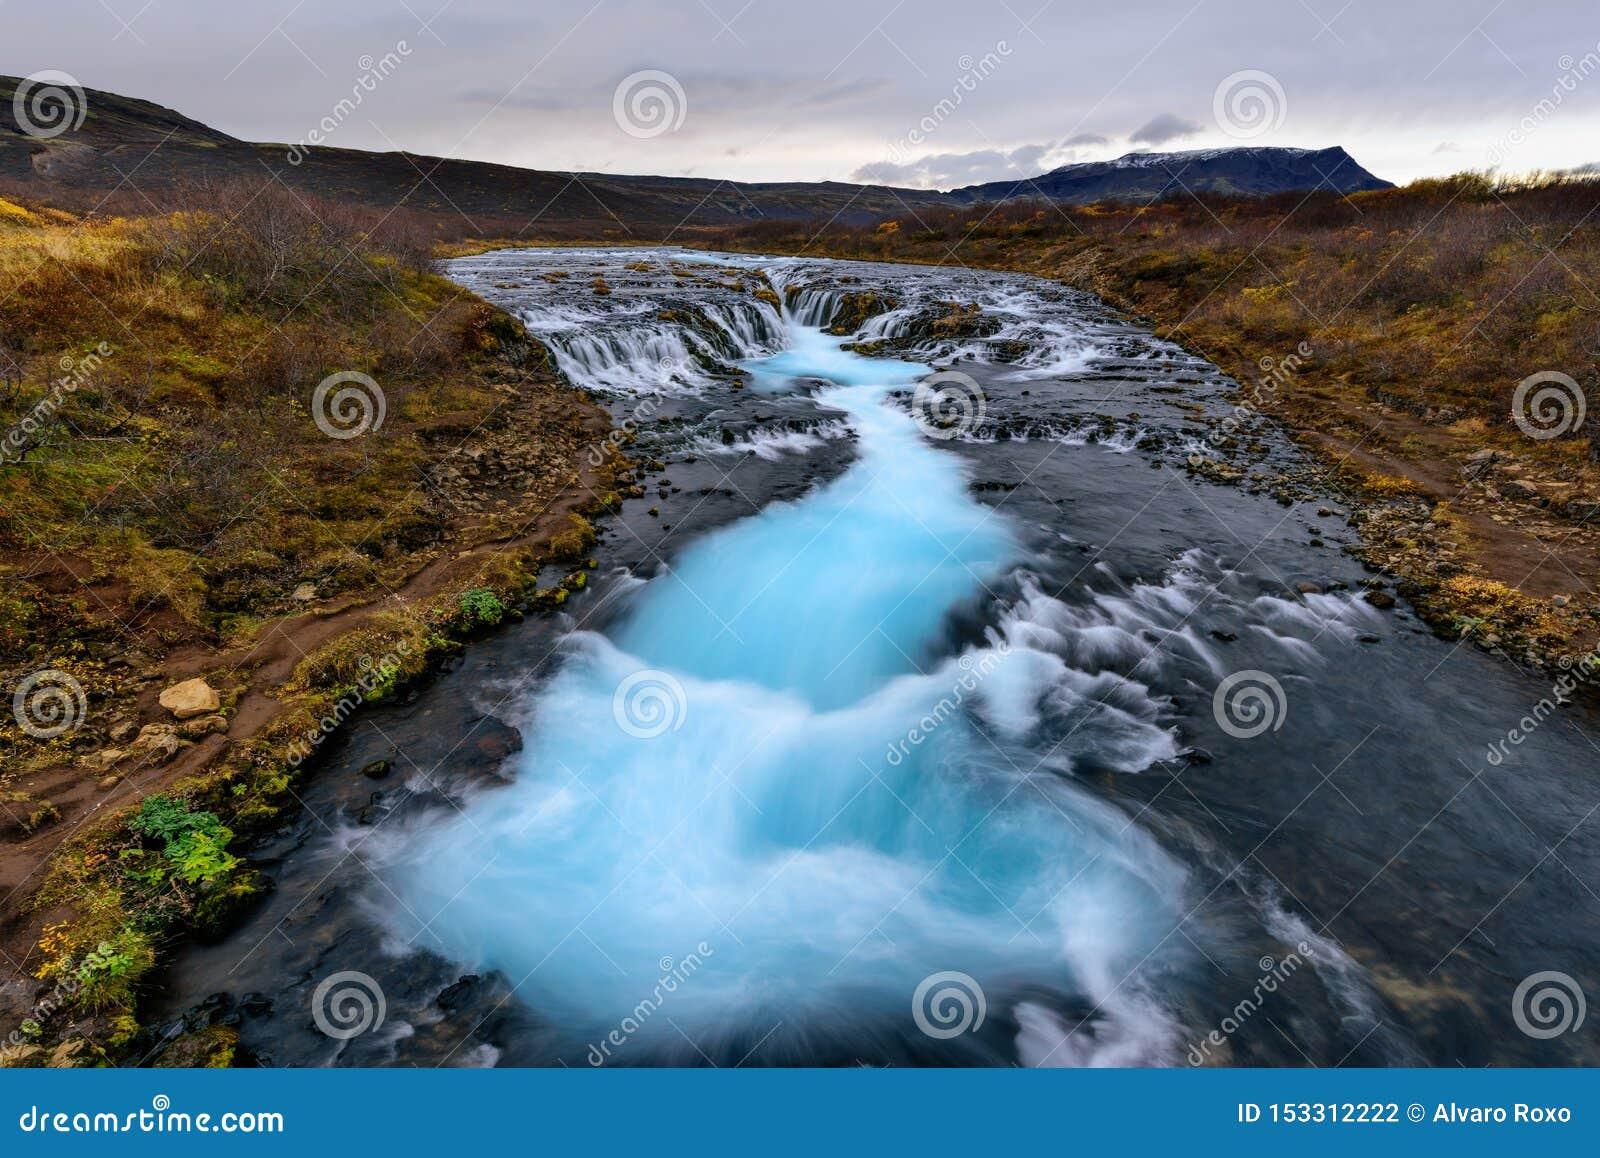 Landschaft von Bruarfoss-Wasserfall in Island bei Sonnenuntergang Berühmtes Naturdenkmal Bruarfoss und touristischer Bestimmungso